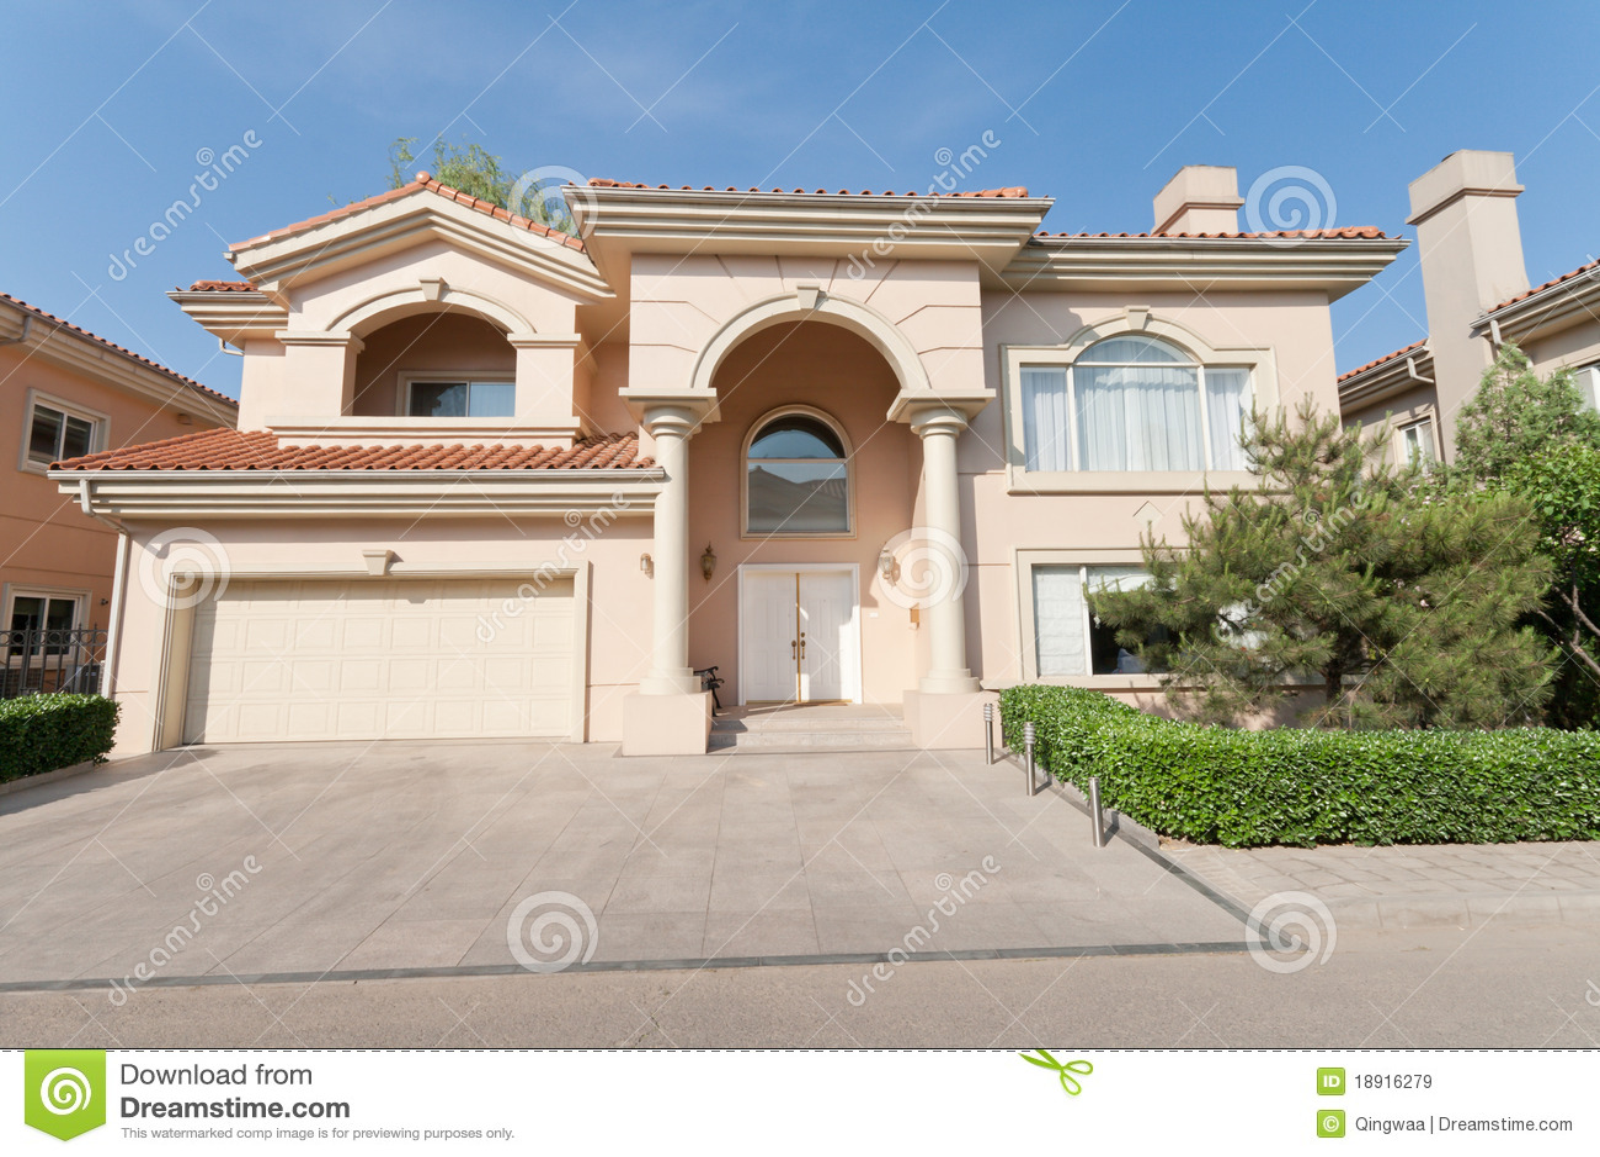 mediterranean single family house beijing china royalty free